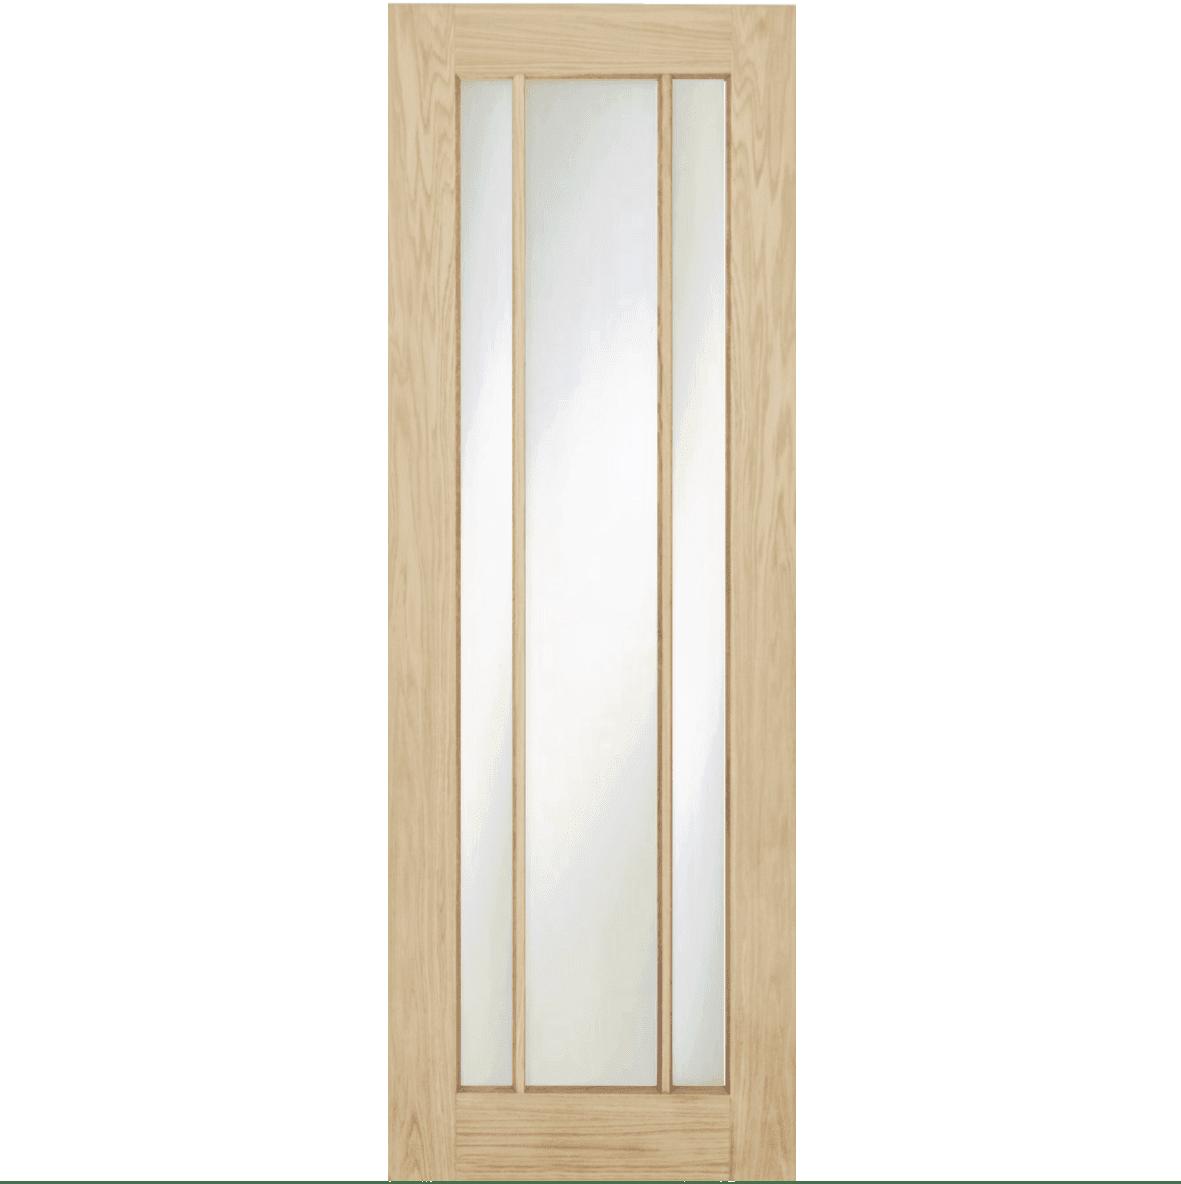 Oak Langdale Frosted Glass Door Amp Frame Kit Green Tree Doors